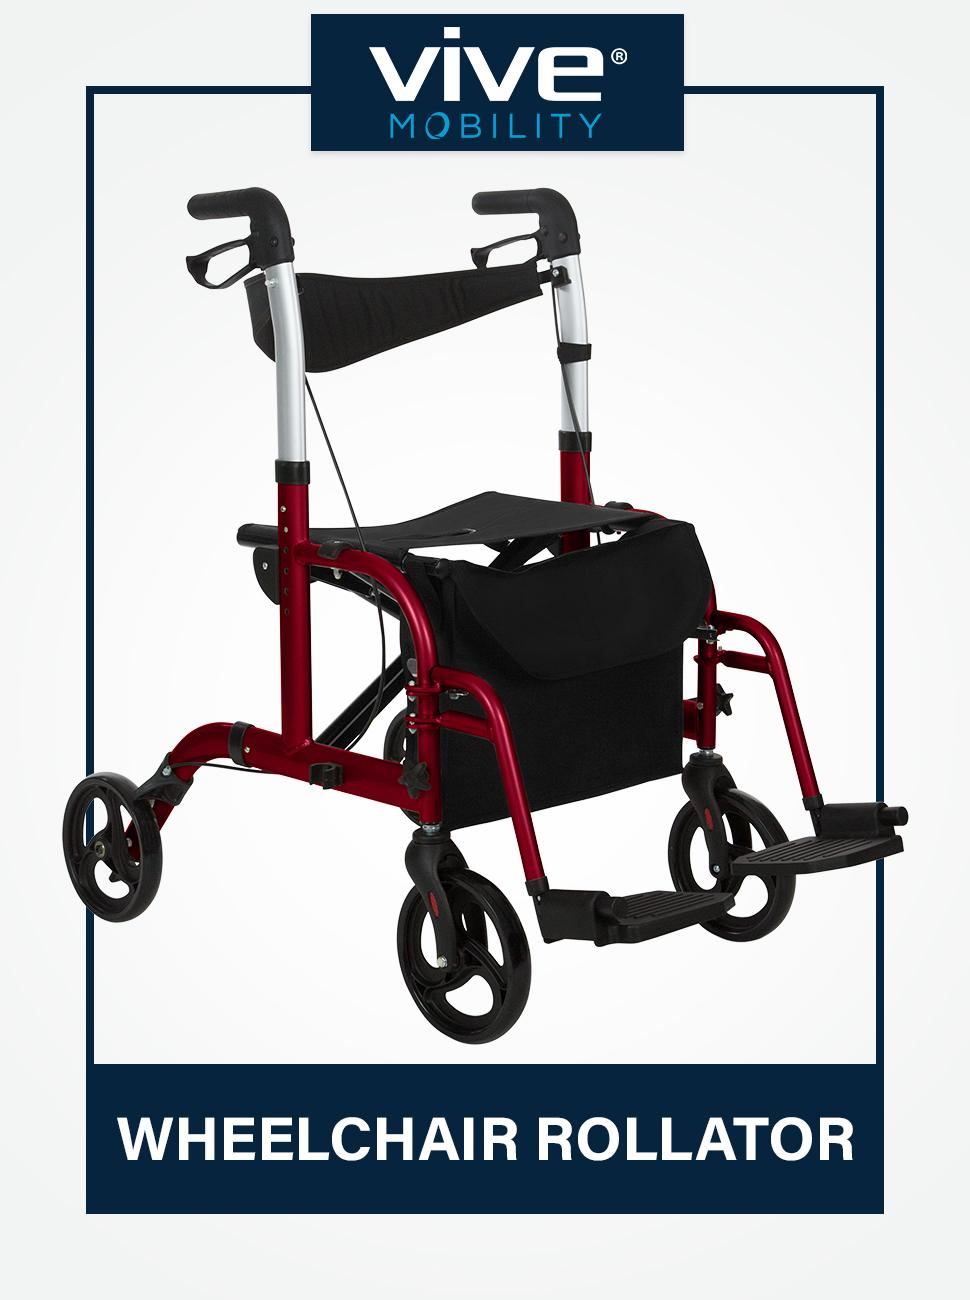 Vive Mobility Rollator Walker Seat  Wheelchair Transport Chair  8 Inch Wheels  Foldable, Lightweight